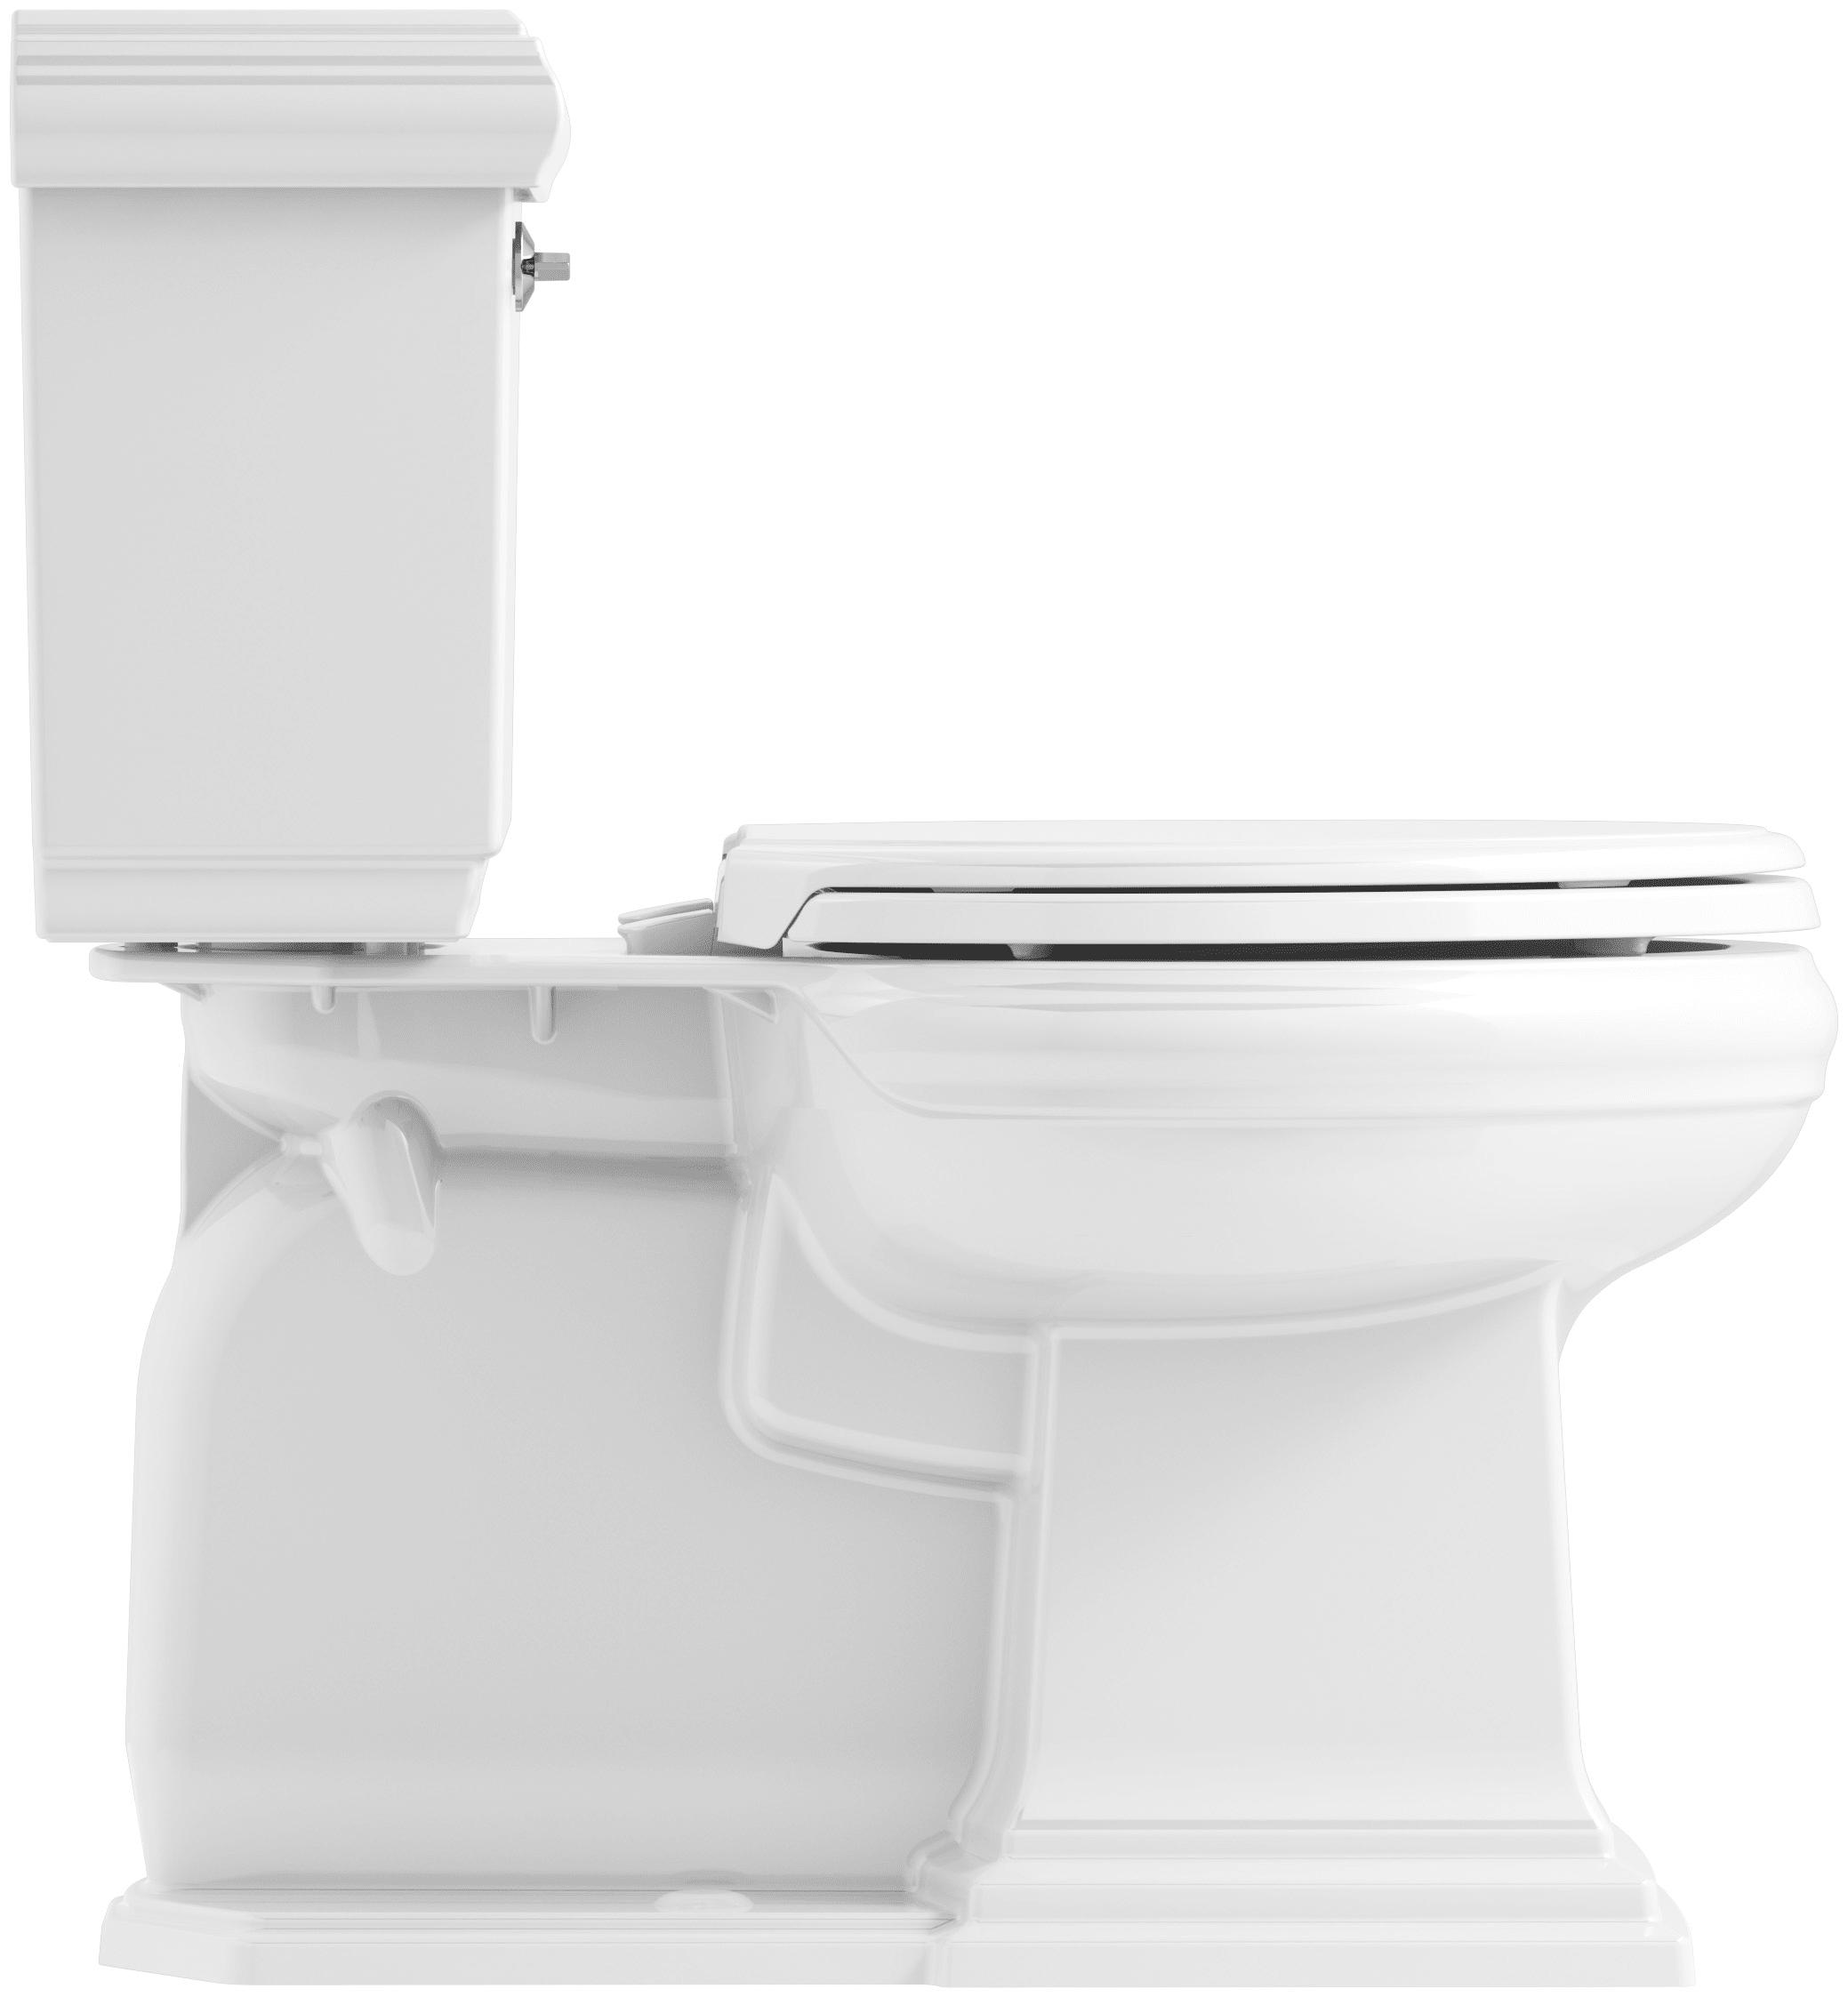 widespread memoirs cross value with bathroom web faucet handles kohler my sink pinstripe faucets